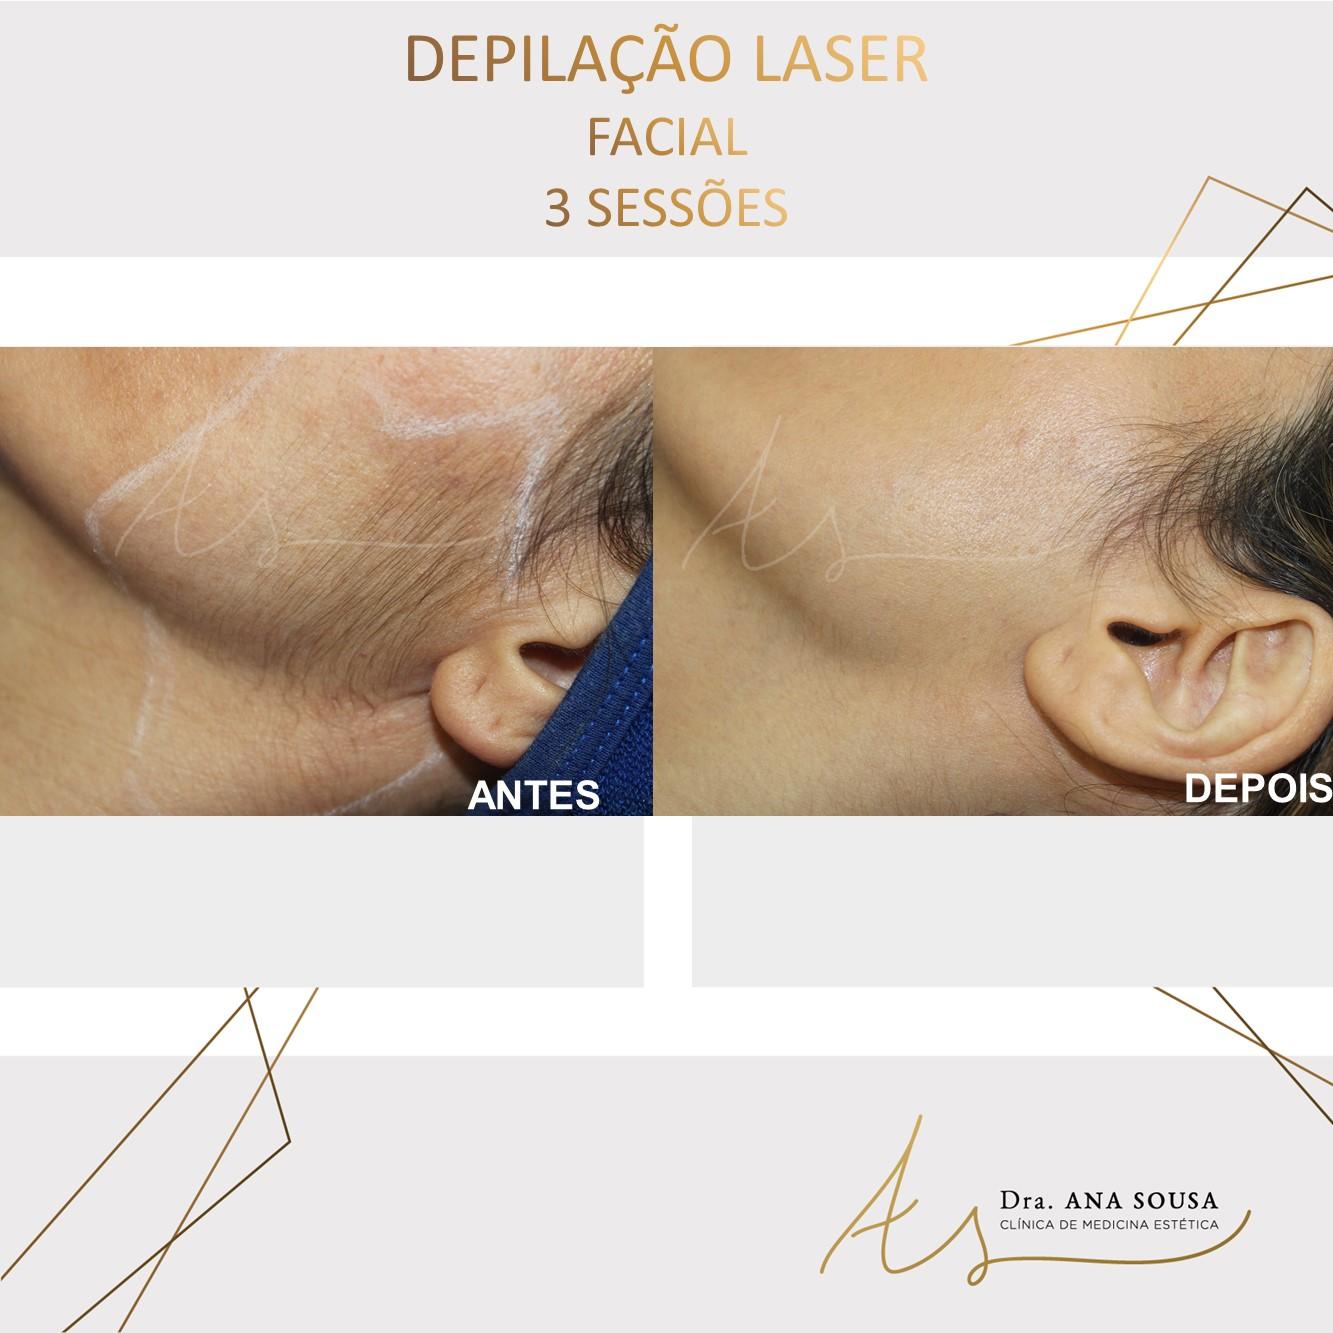 Depilaçao laser facial